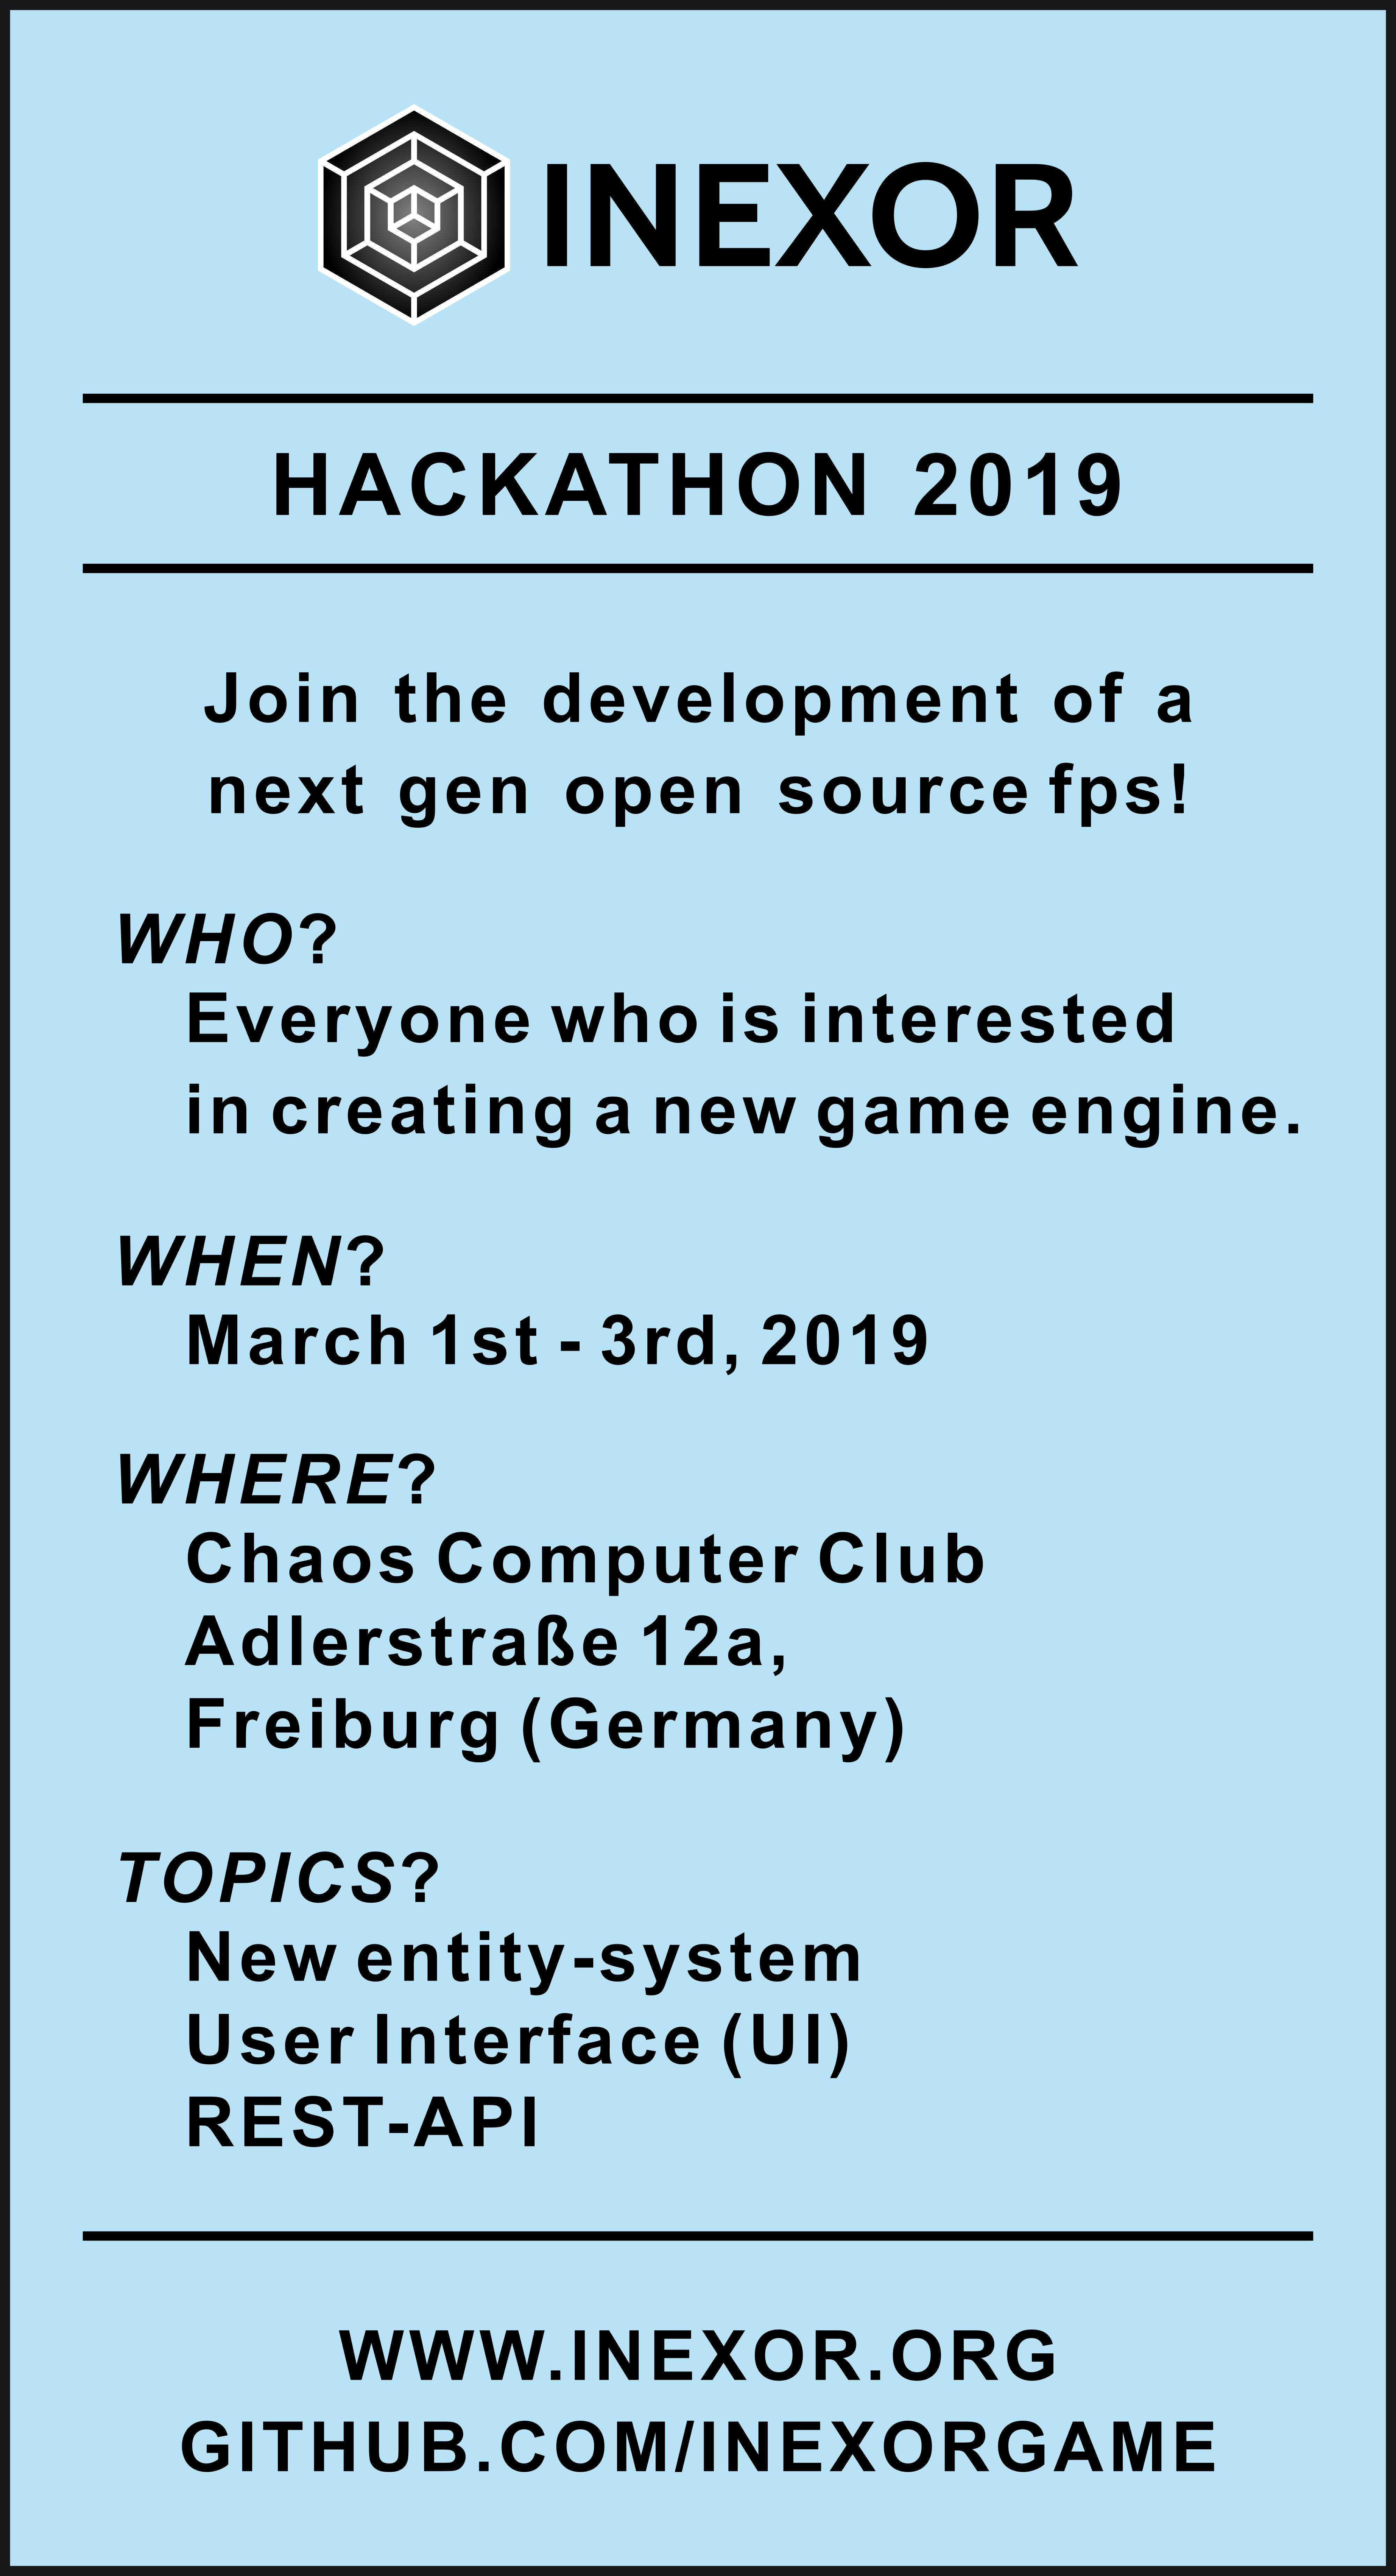 Inexor Hackathon 2019